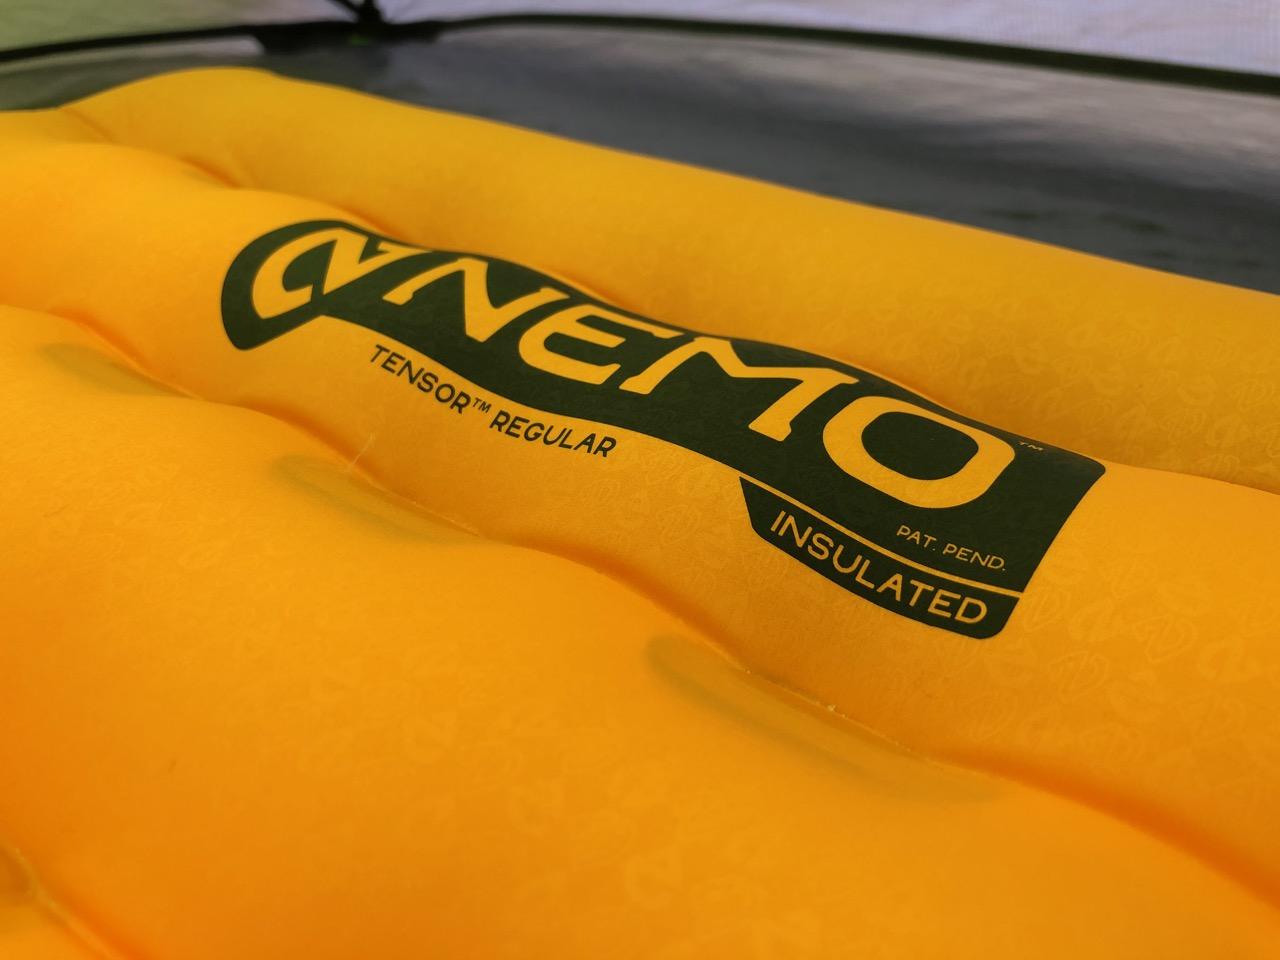 NEMO Tensor Regular Insulated Ultralight Sleeping Pad (2019) Close Up of Logo